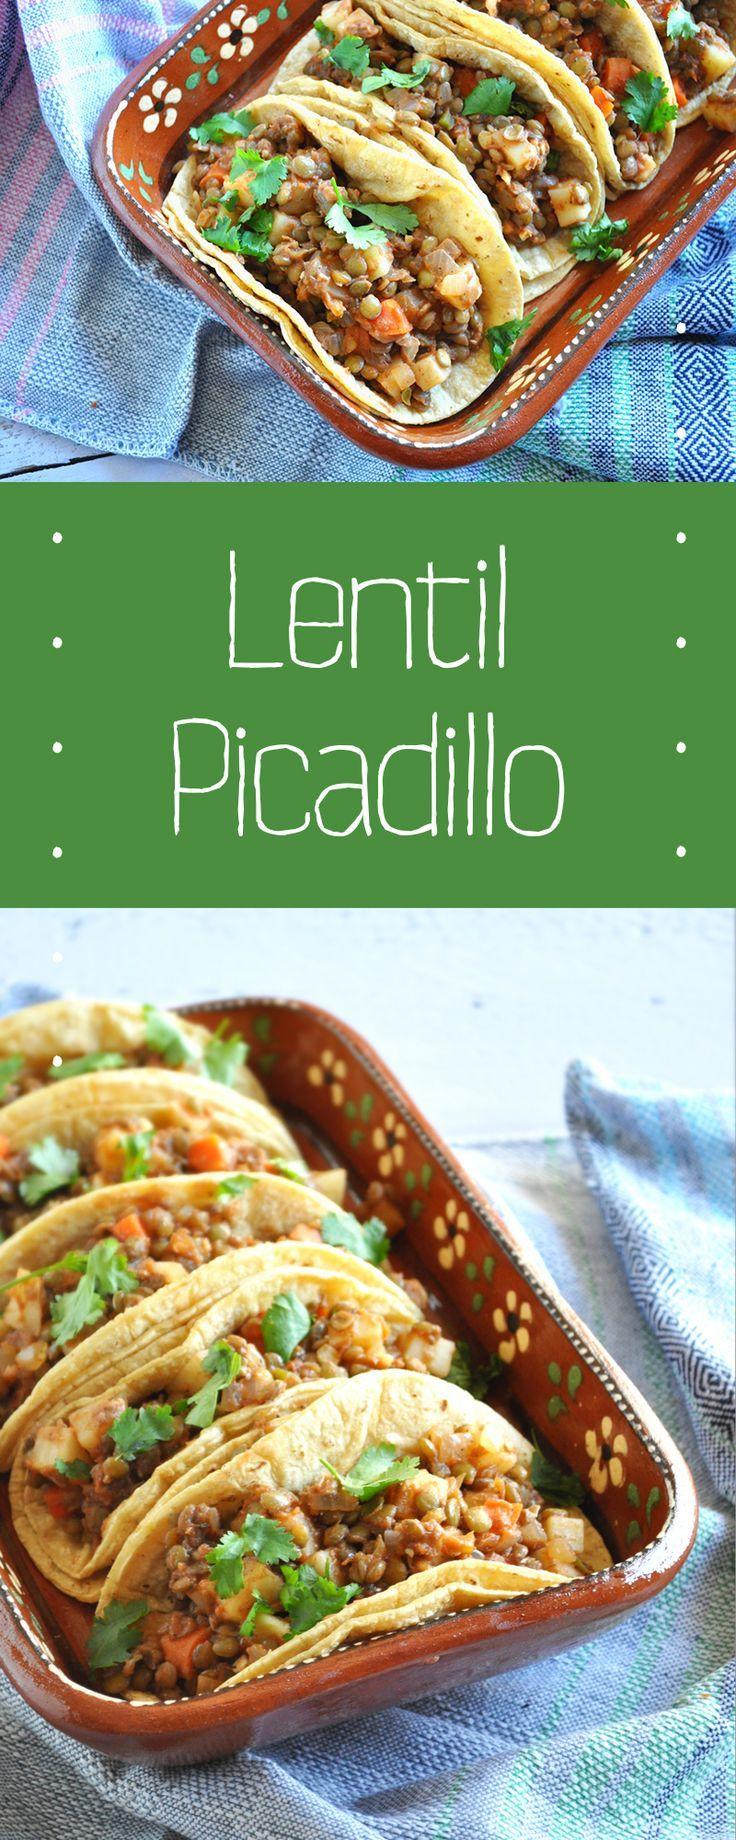 Lentil Picadillo